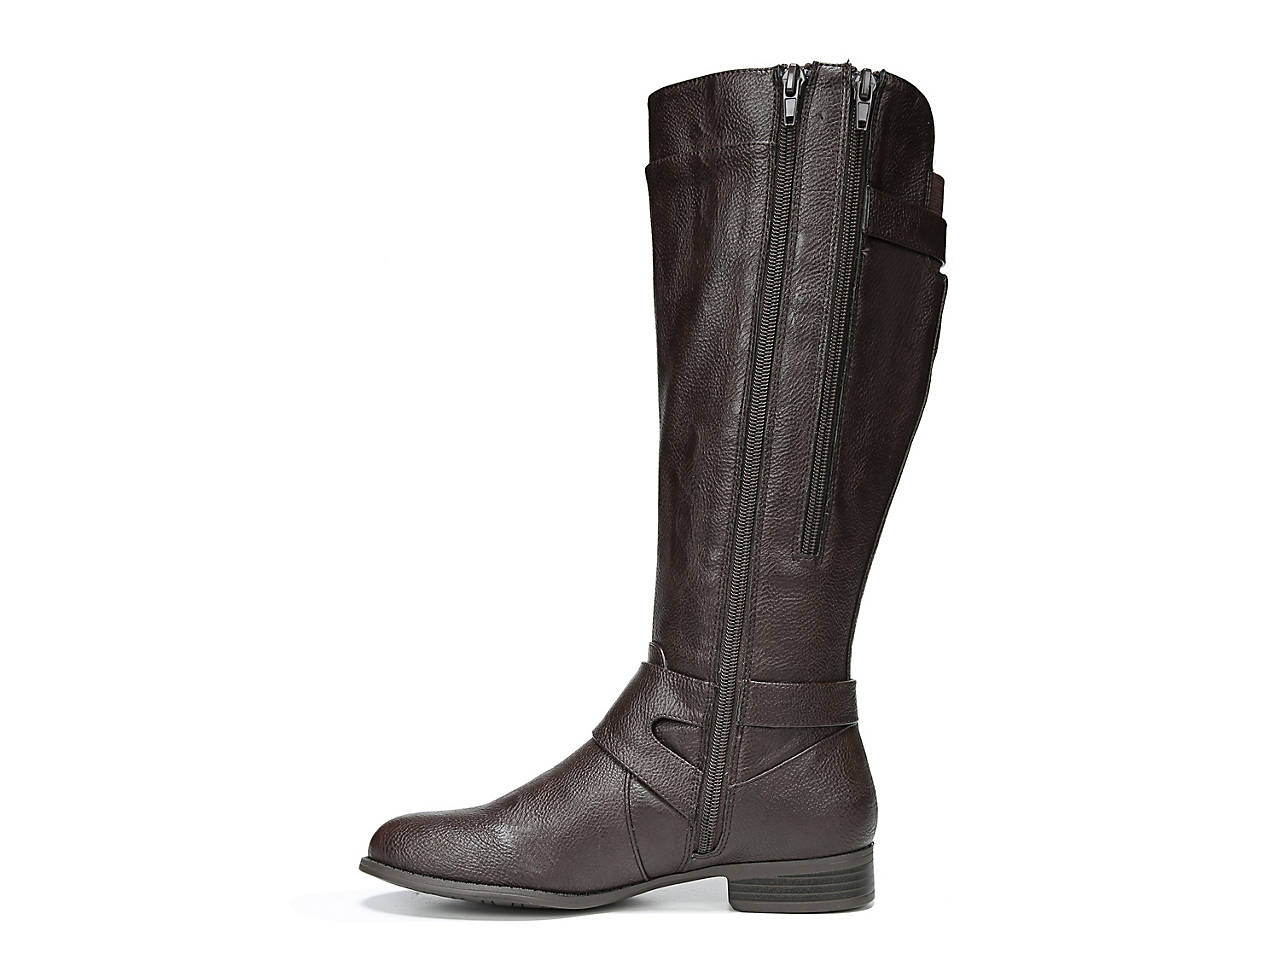 3cddca25c317 LifeStride Fallon Riding Boot Women s Shoes